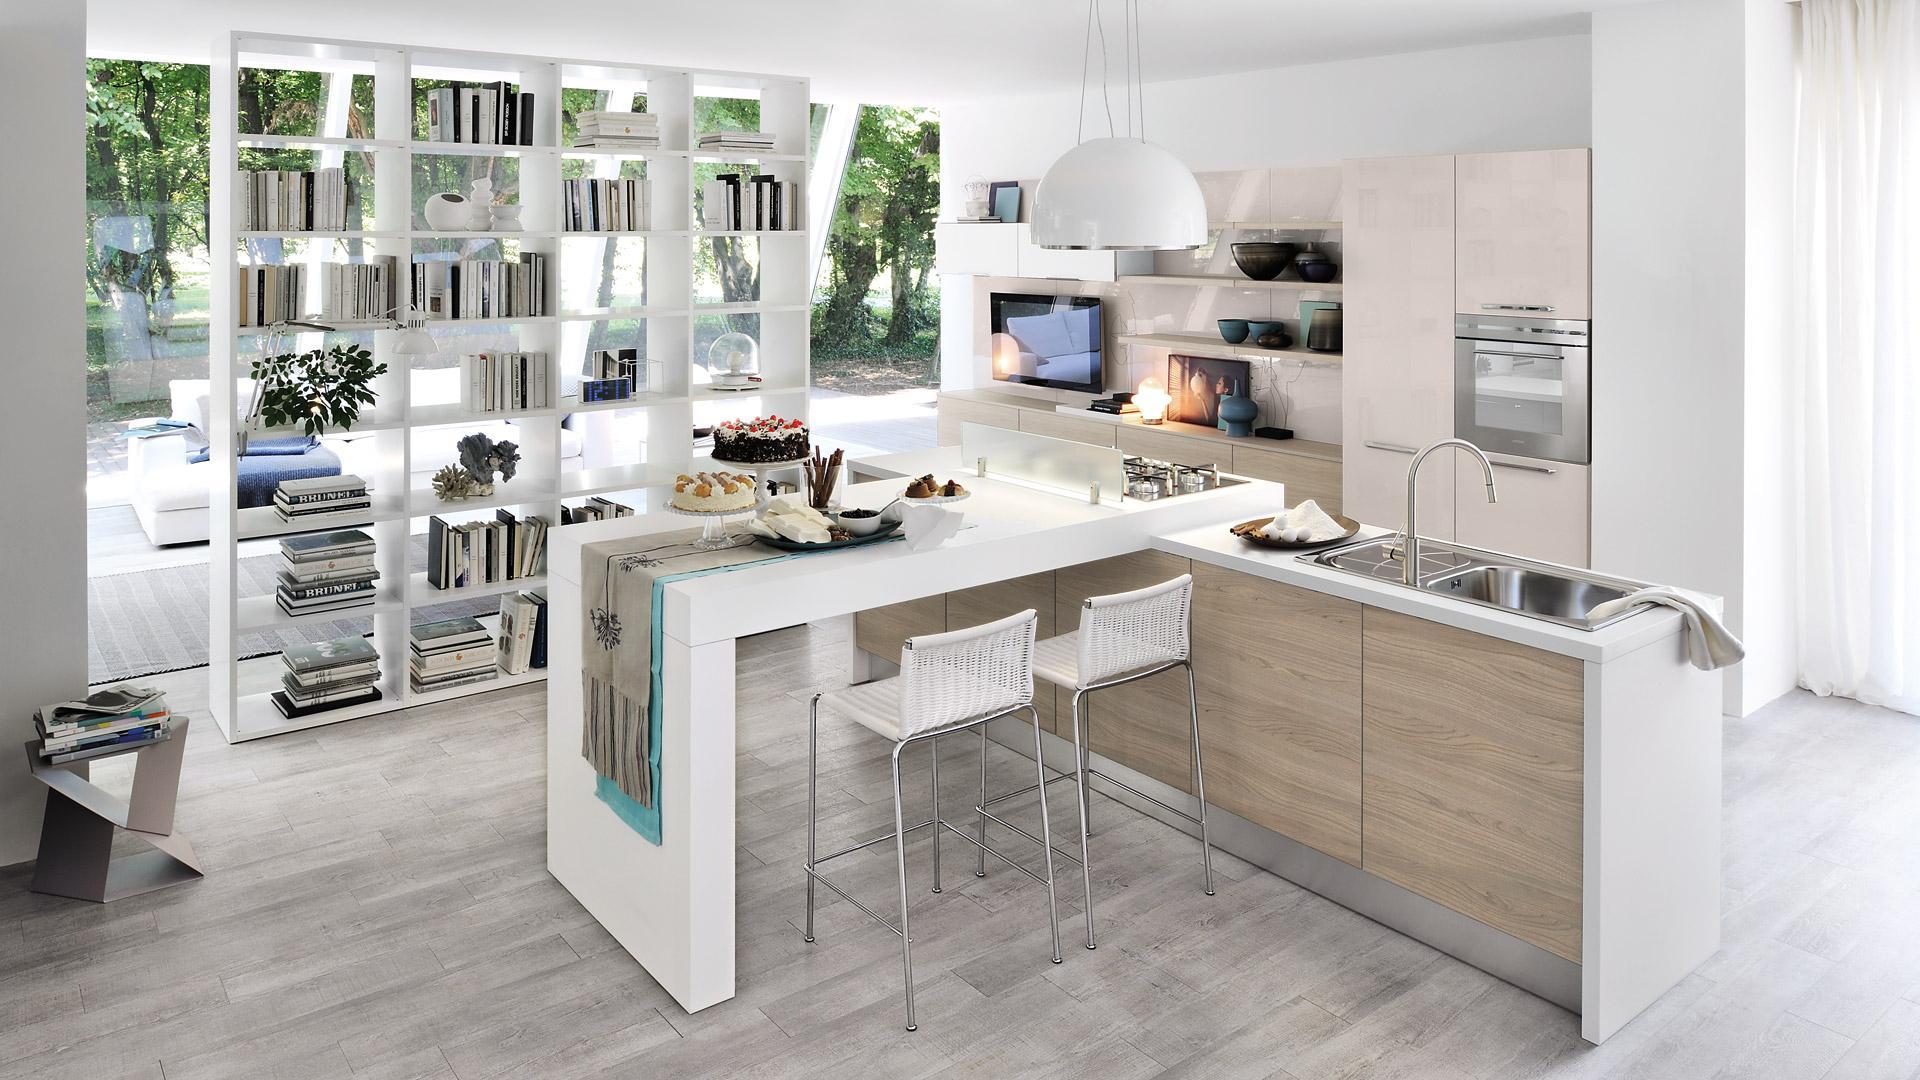 Piccola E Abitabile Cucine Moderne Per Ambienti Piccoli. 20se.co #51697A 1920 1080 Progetti Cucine Per Piccoli Spazi